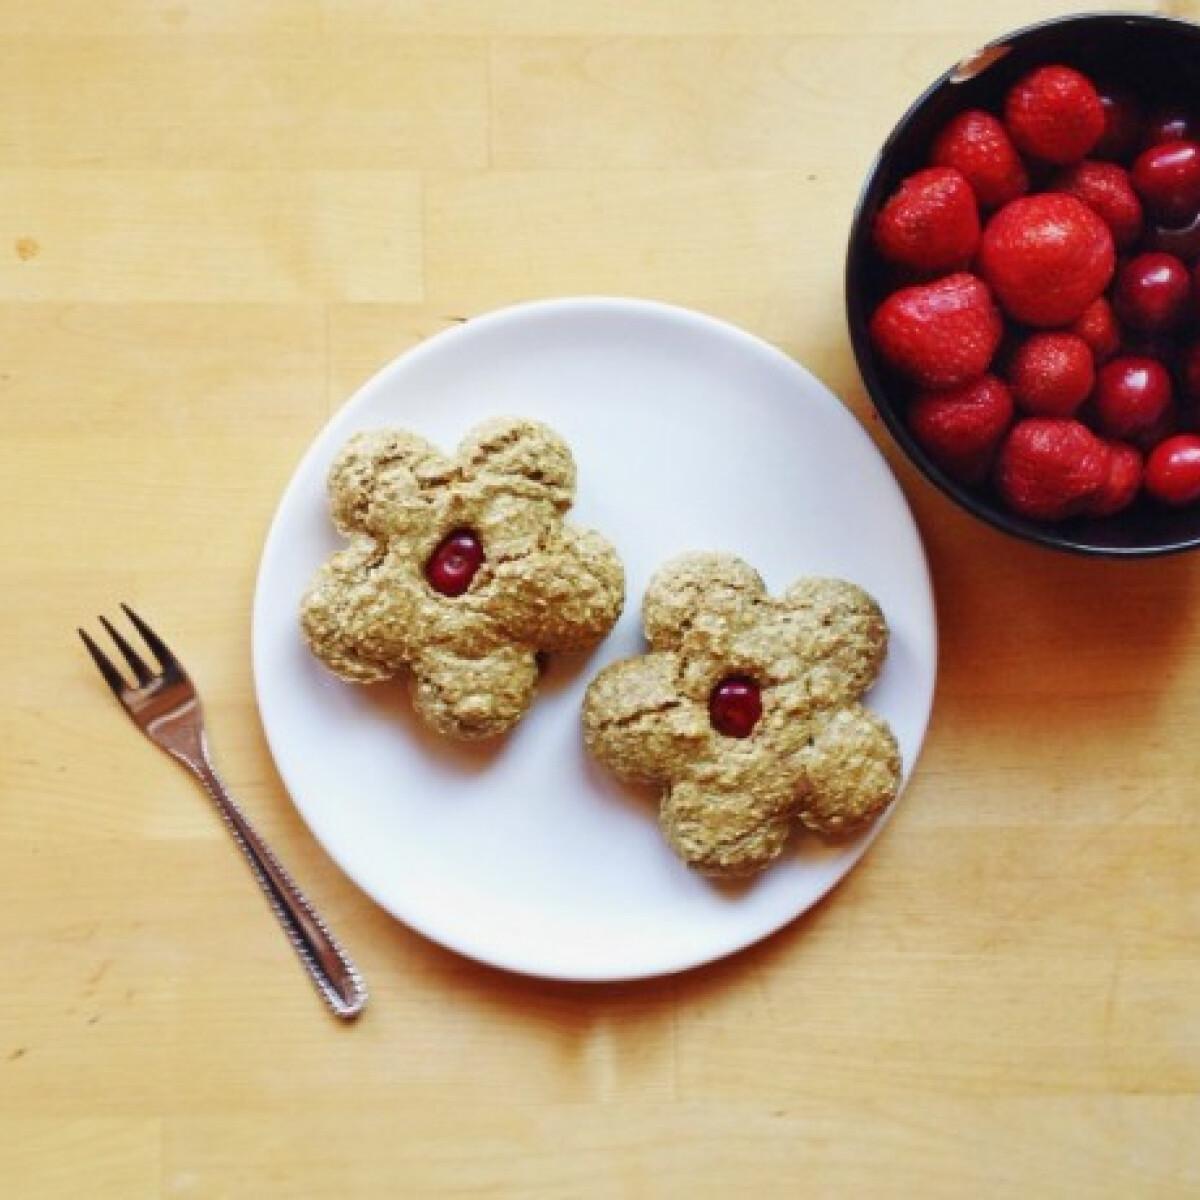 Zabkorpás muffinok reggelire